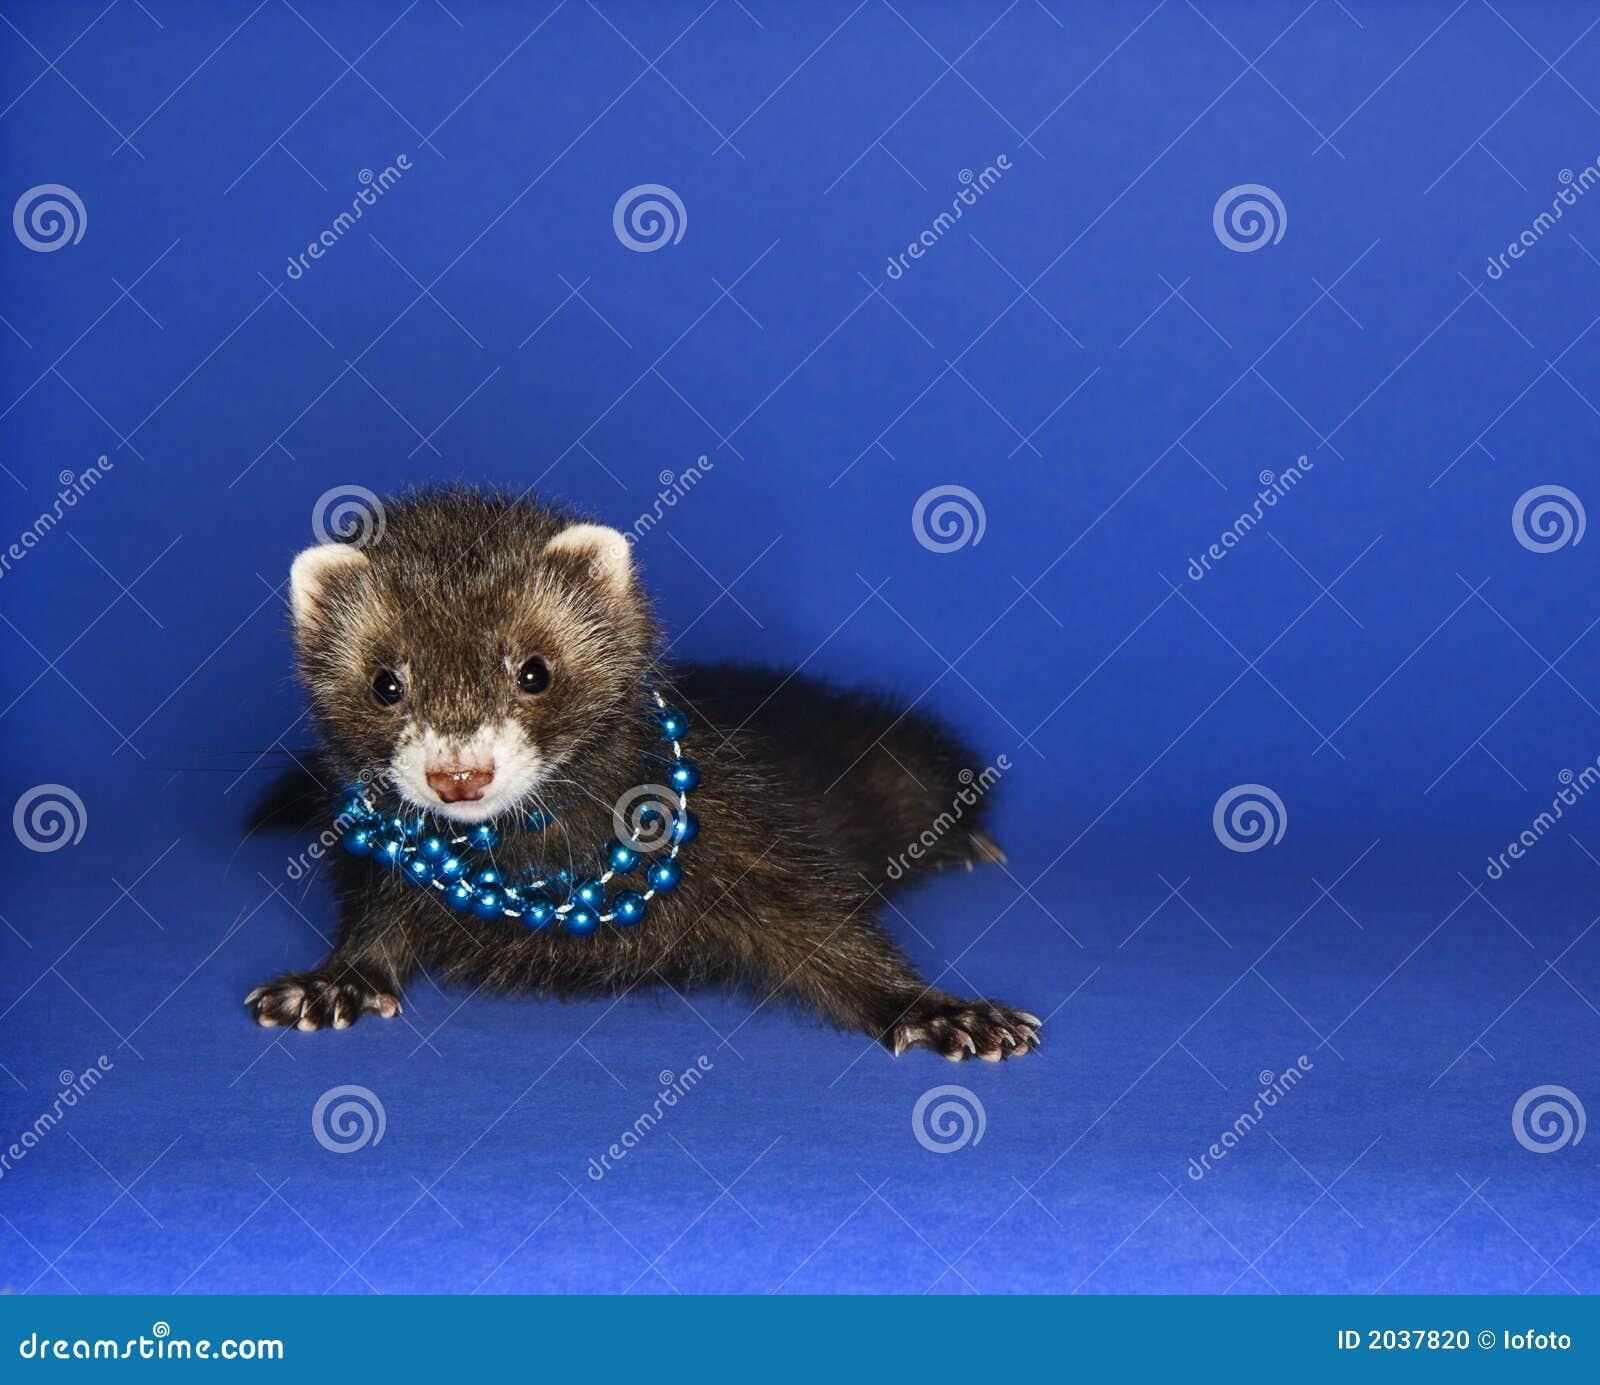 Ferret on blue wearing necklace.